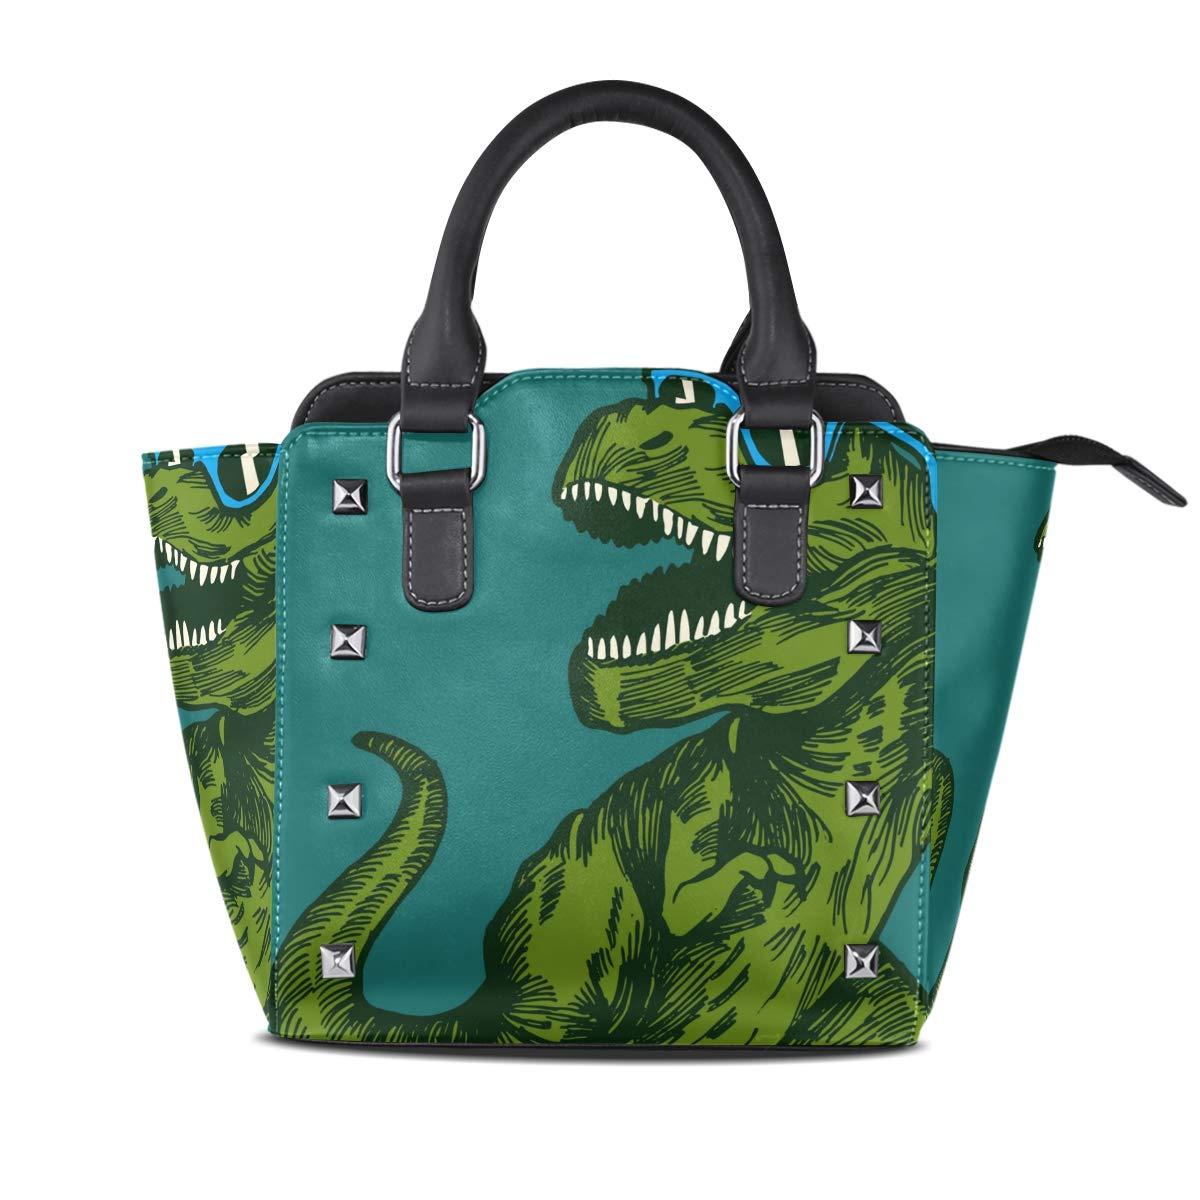 Design3 Handbag Horse Galloping Genuine Leather Tote Rivet Bag Shoulder Strap Top Handle Women